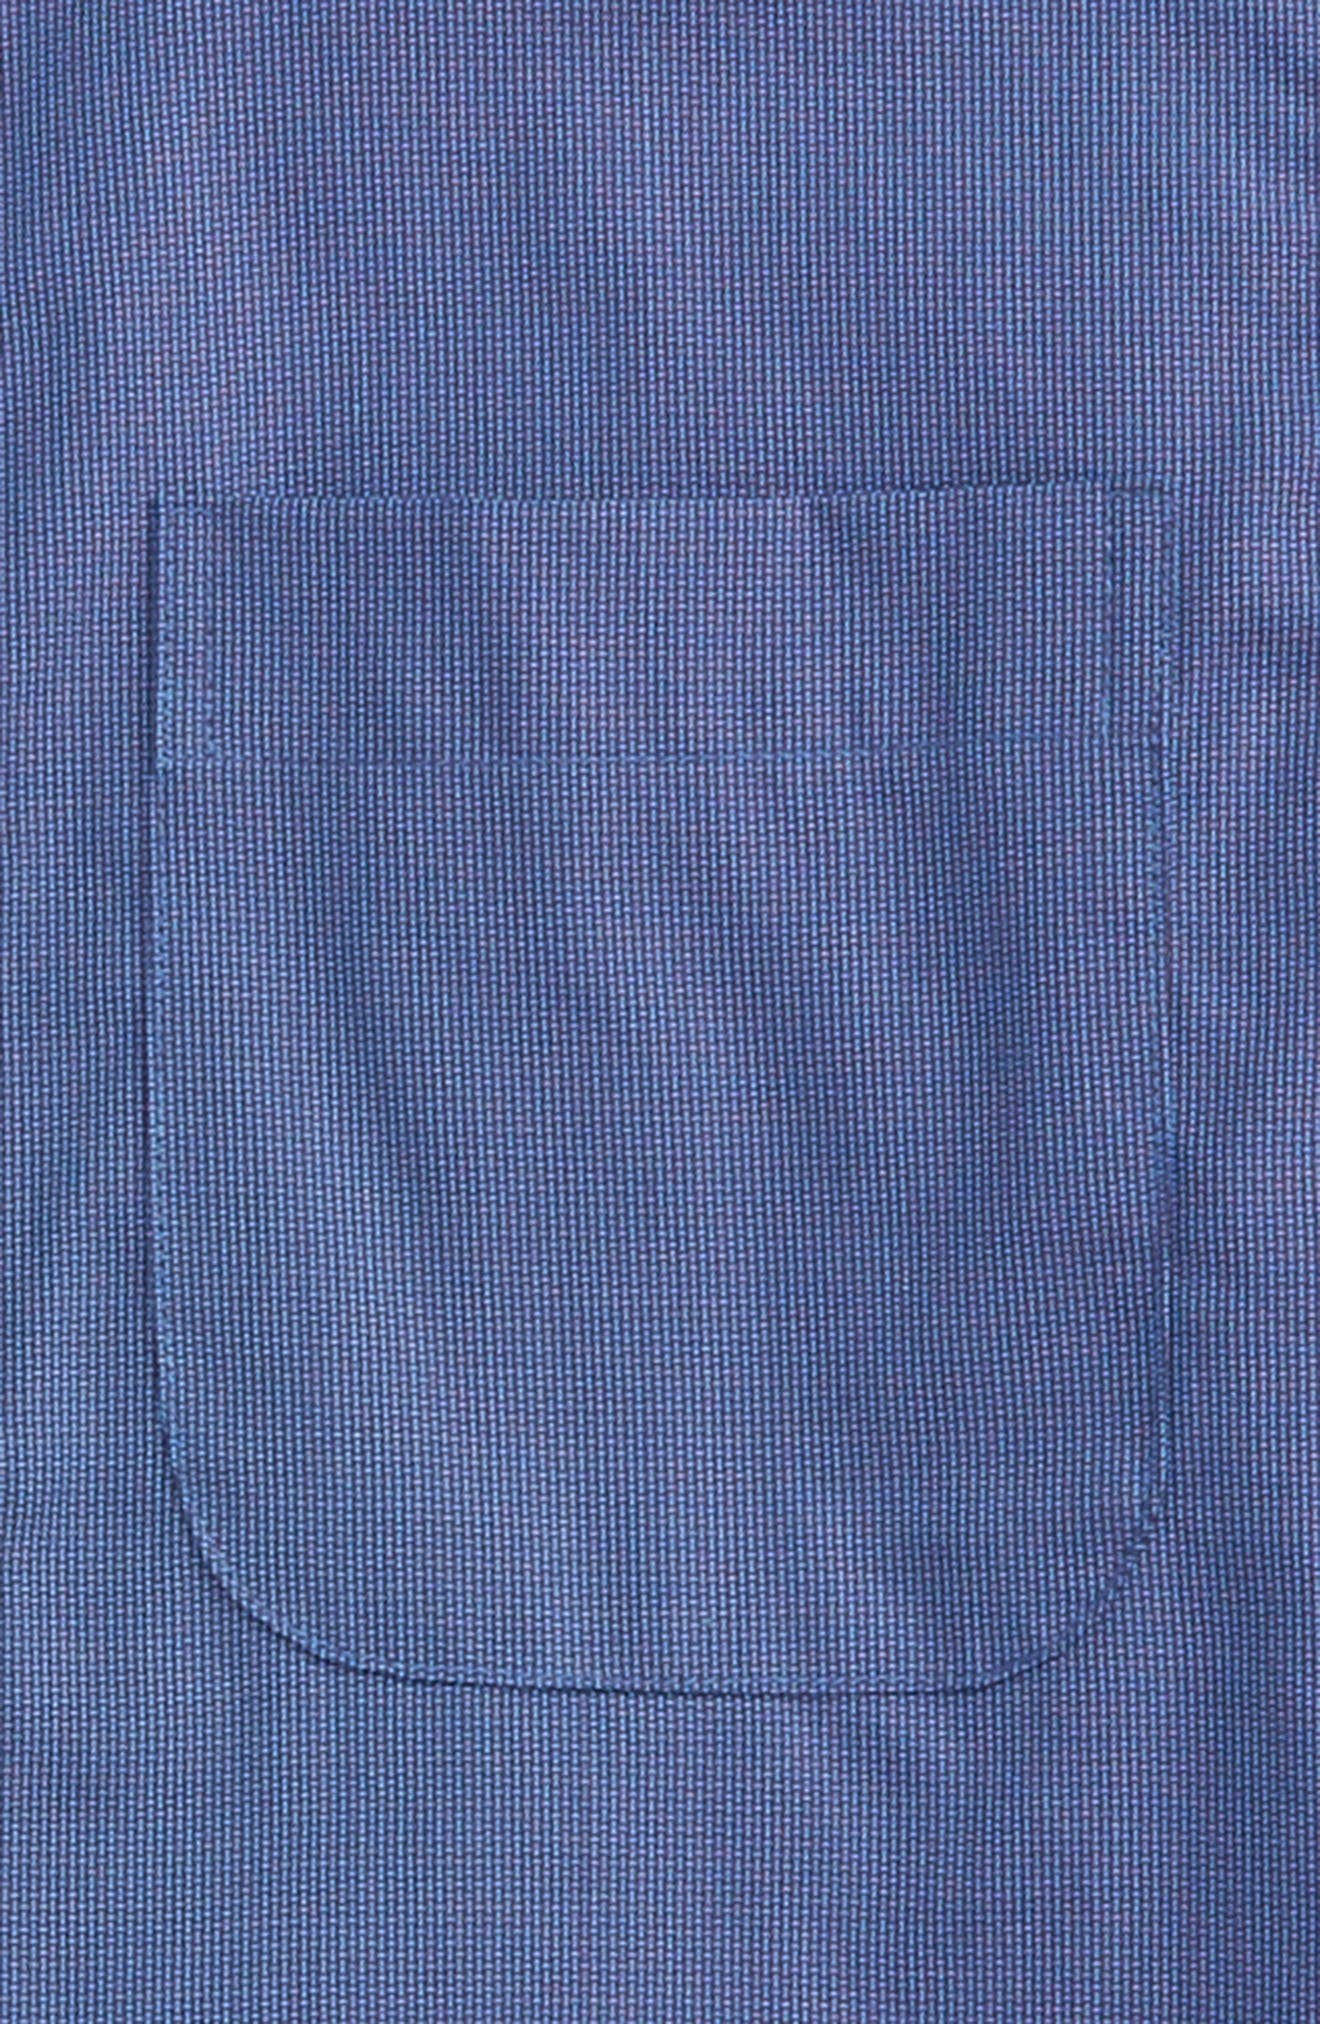 Patriot Cotton Poplin Dress Shirt,                             Alternate thumbnail 2, color,                             Navy Patriot